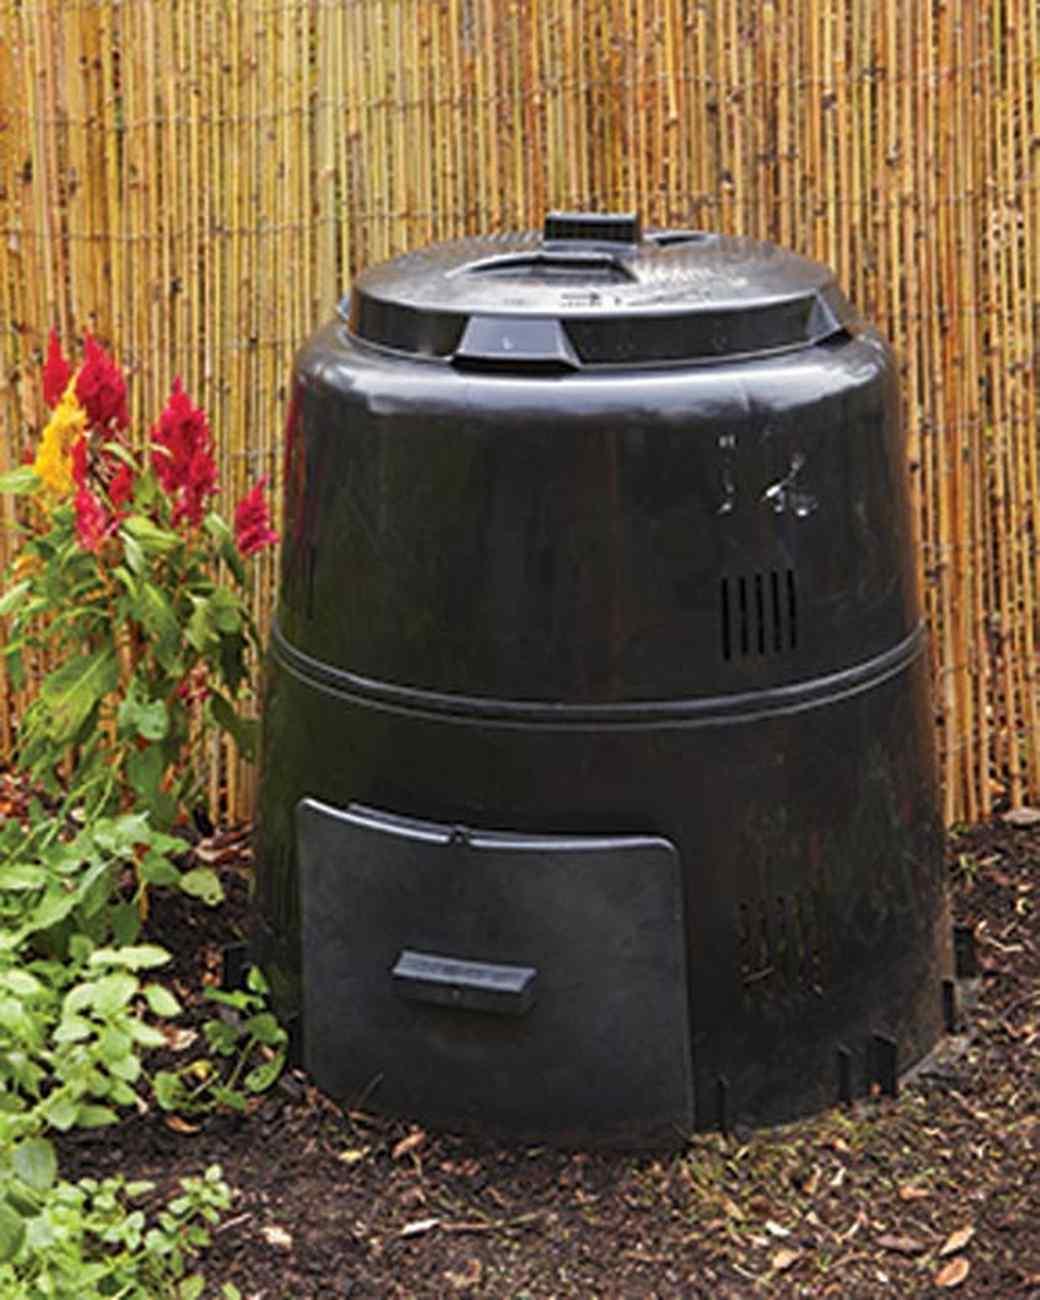 mld105453_1010_compost186.jpg